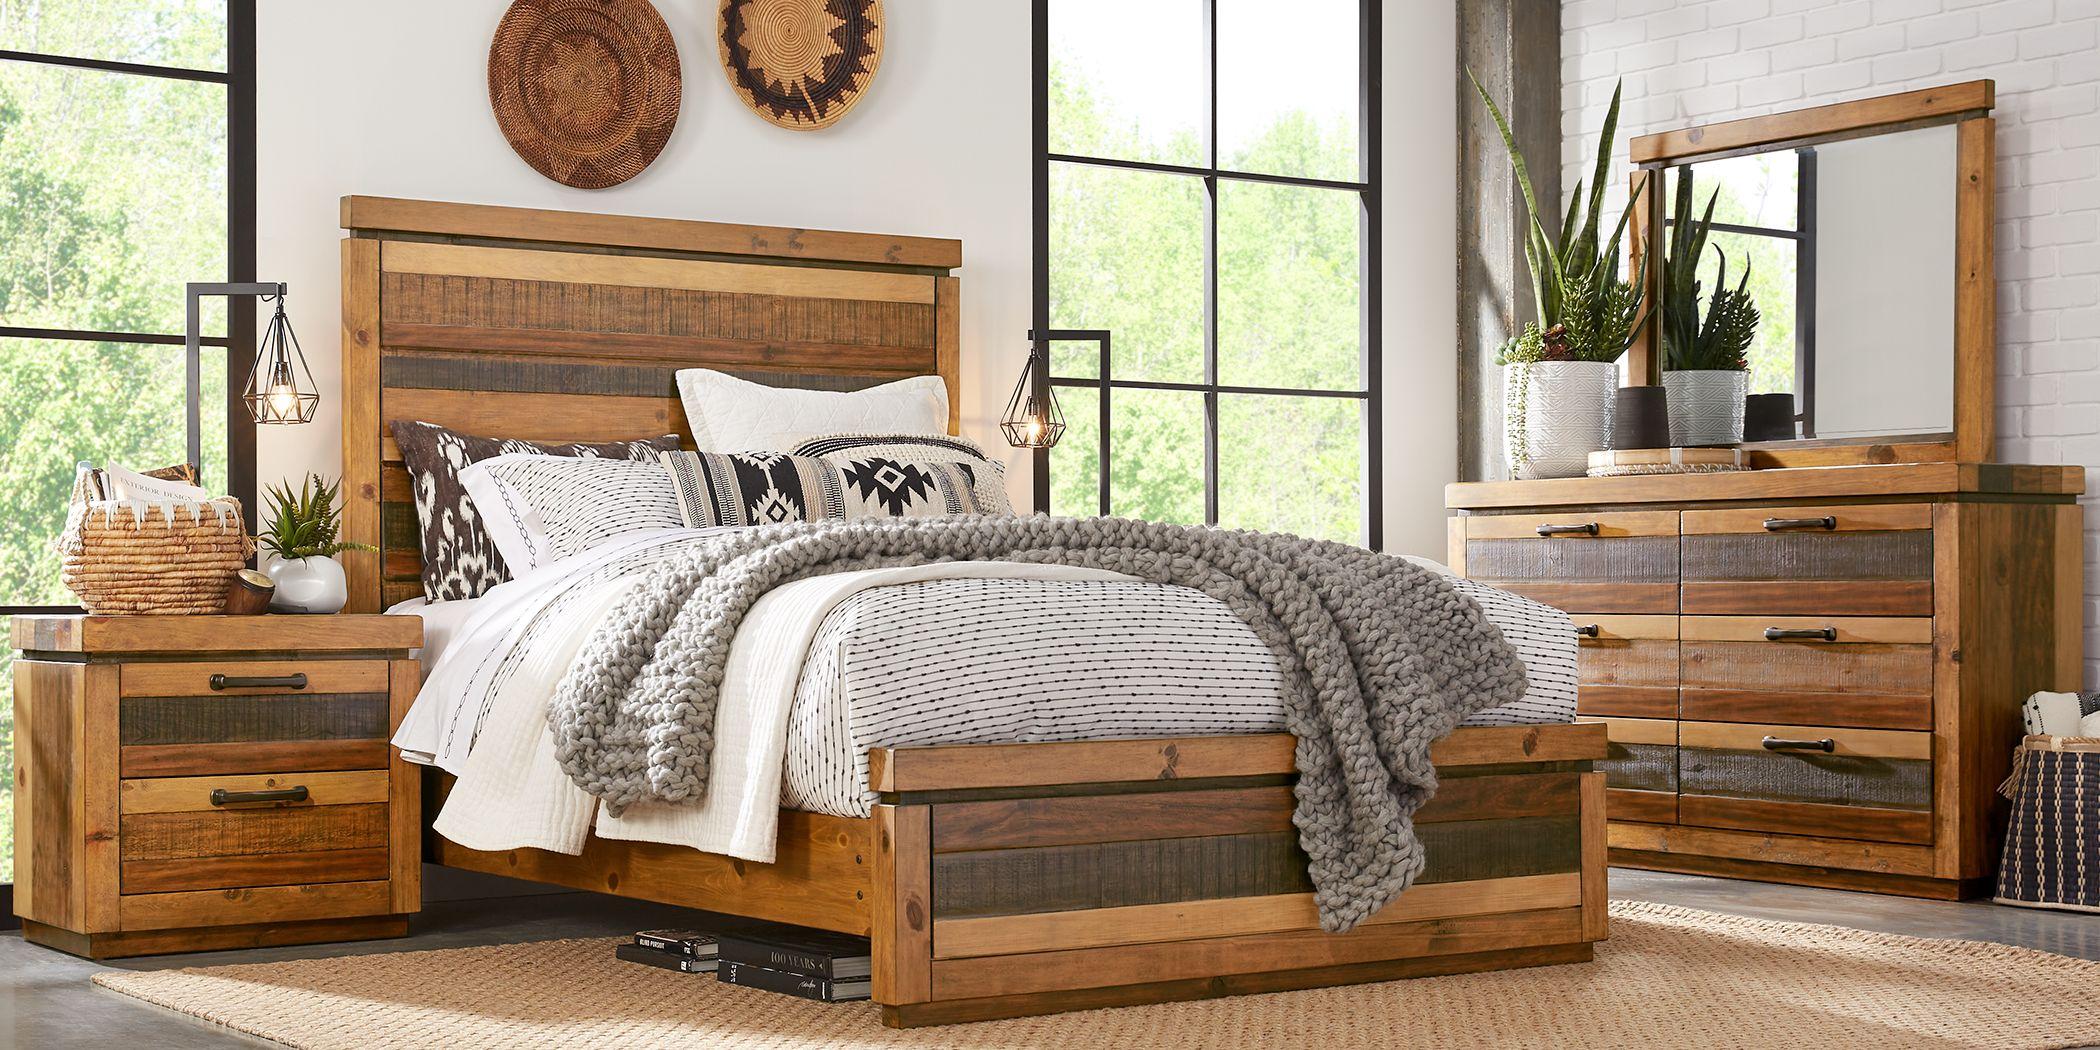 Cindy Crawford Home Westover Hills Brown 7 Pc Queen Panel Bedroom